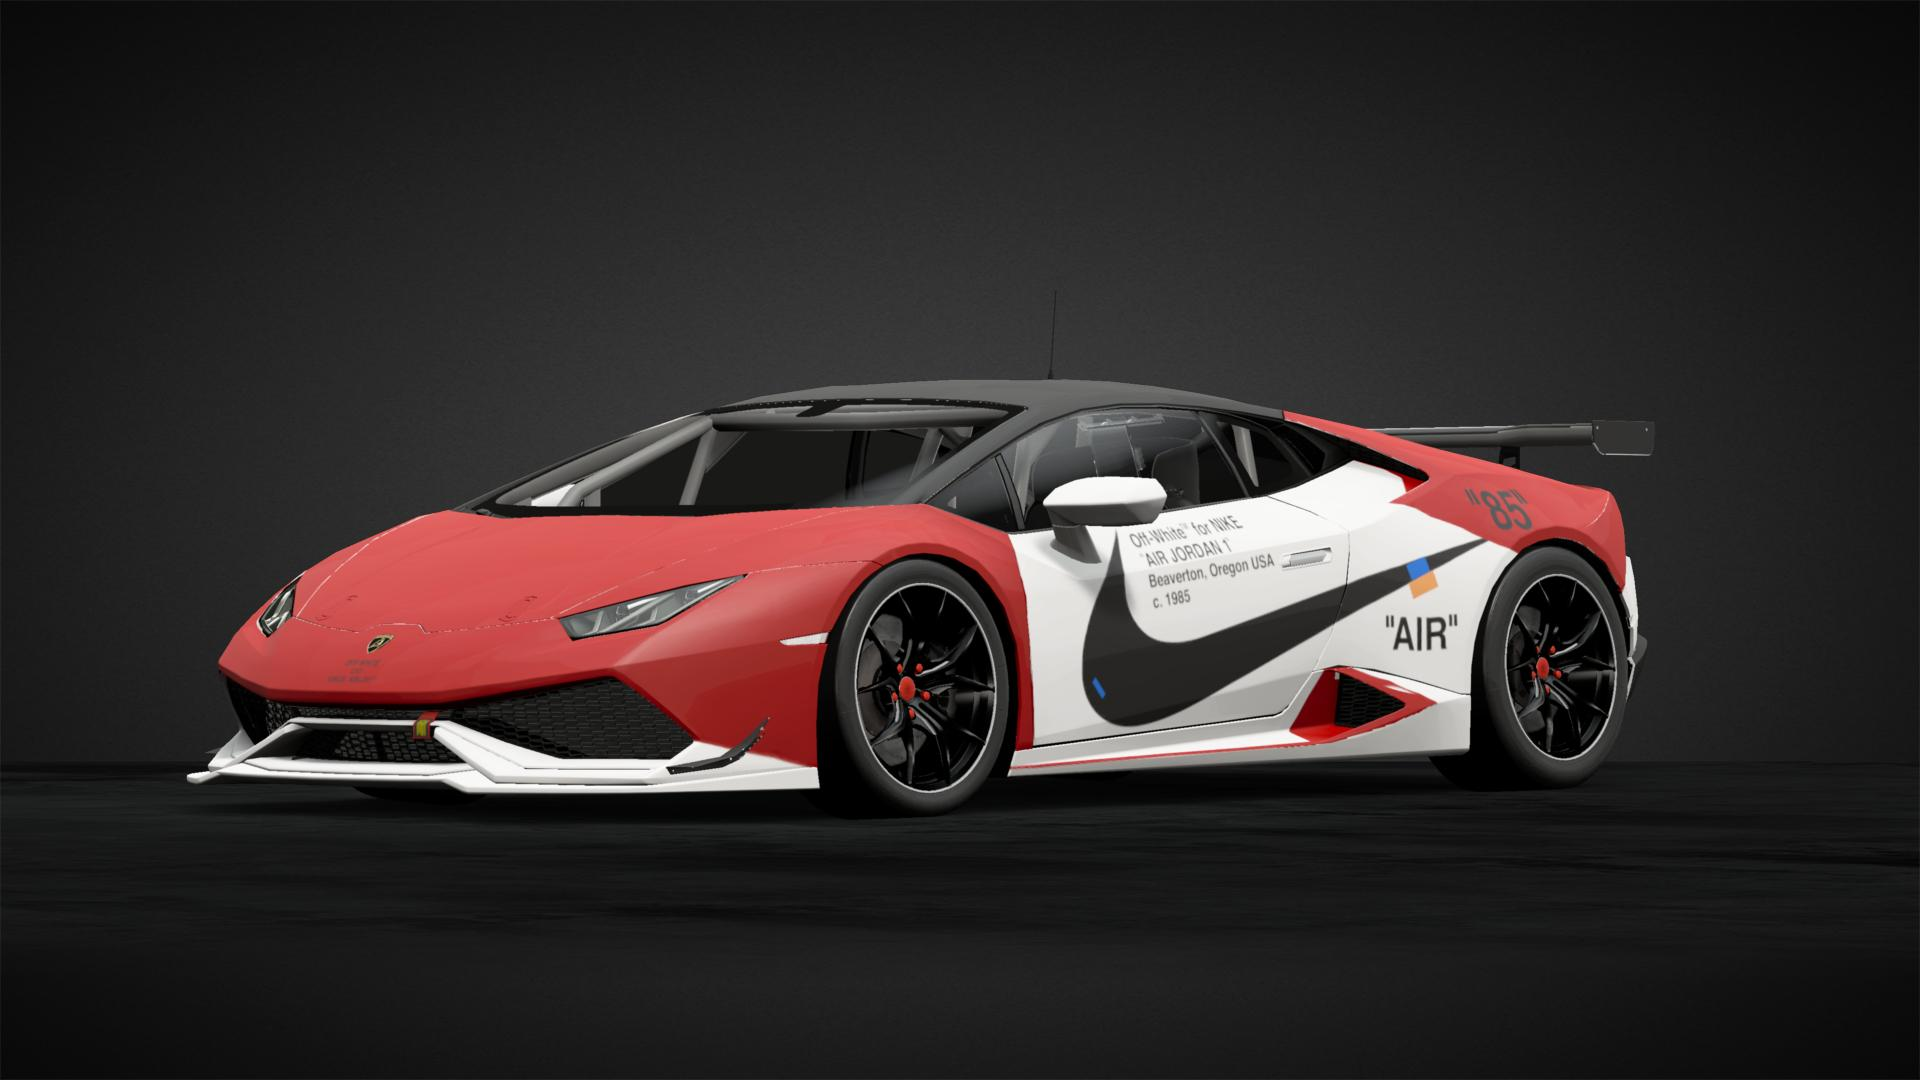 Off White X Air Jordan 1 Huracan Car Livery By Croxxon Community Gran Turismo Sport